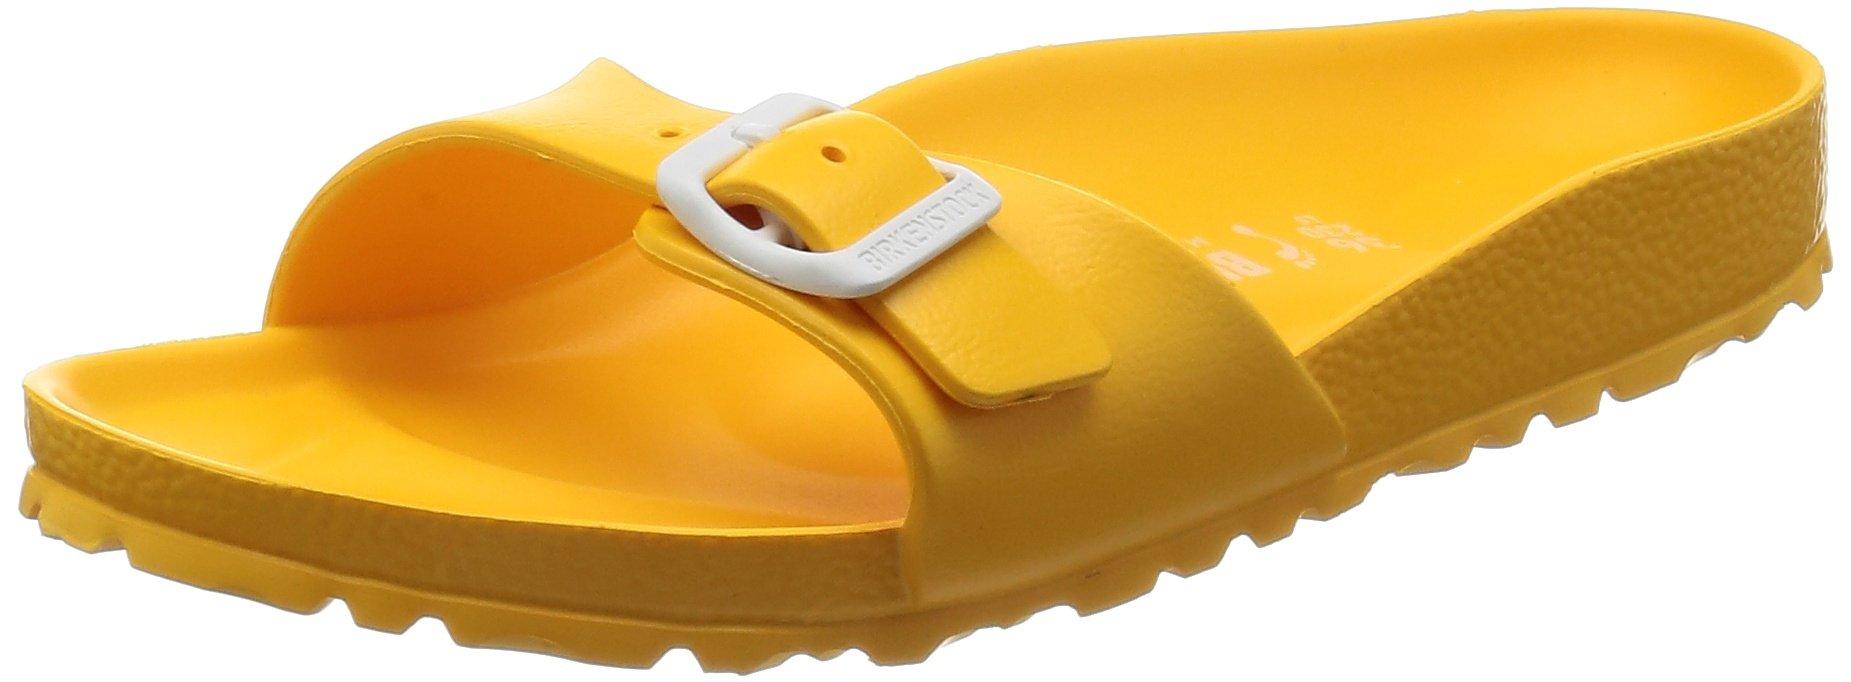 Birkenstock Madrid EVA Narrow Fit- Scuba Yellow 1003516 (Man-Made) Womens Sandals 37 EU